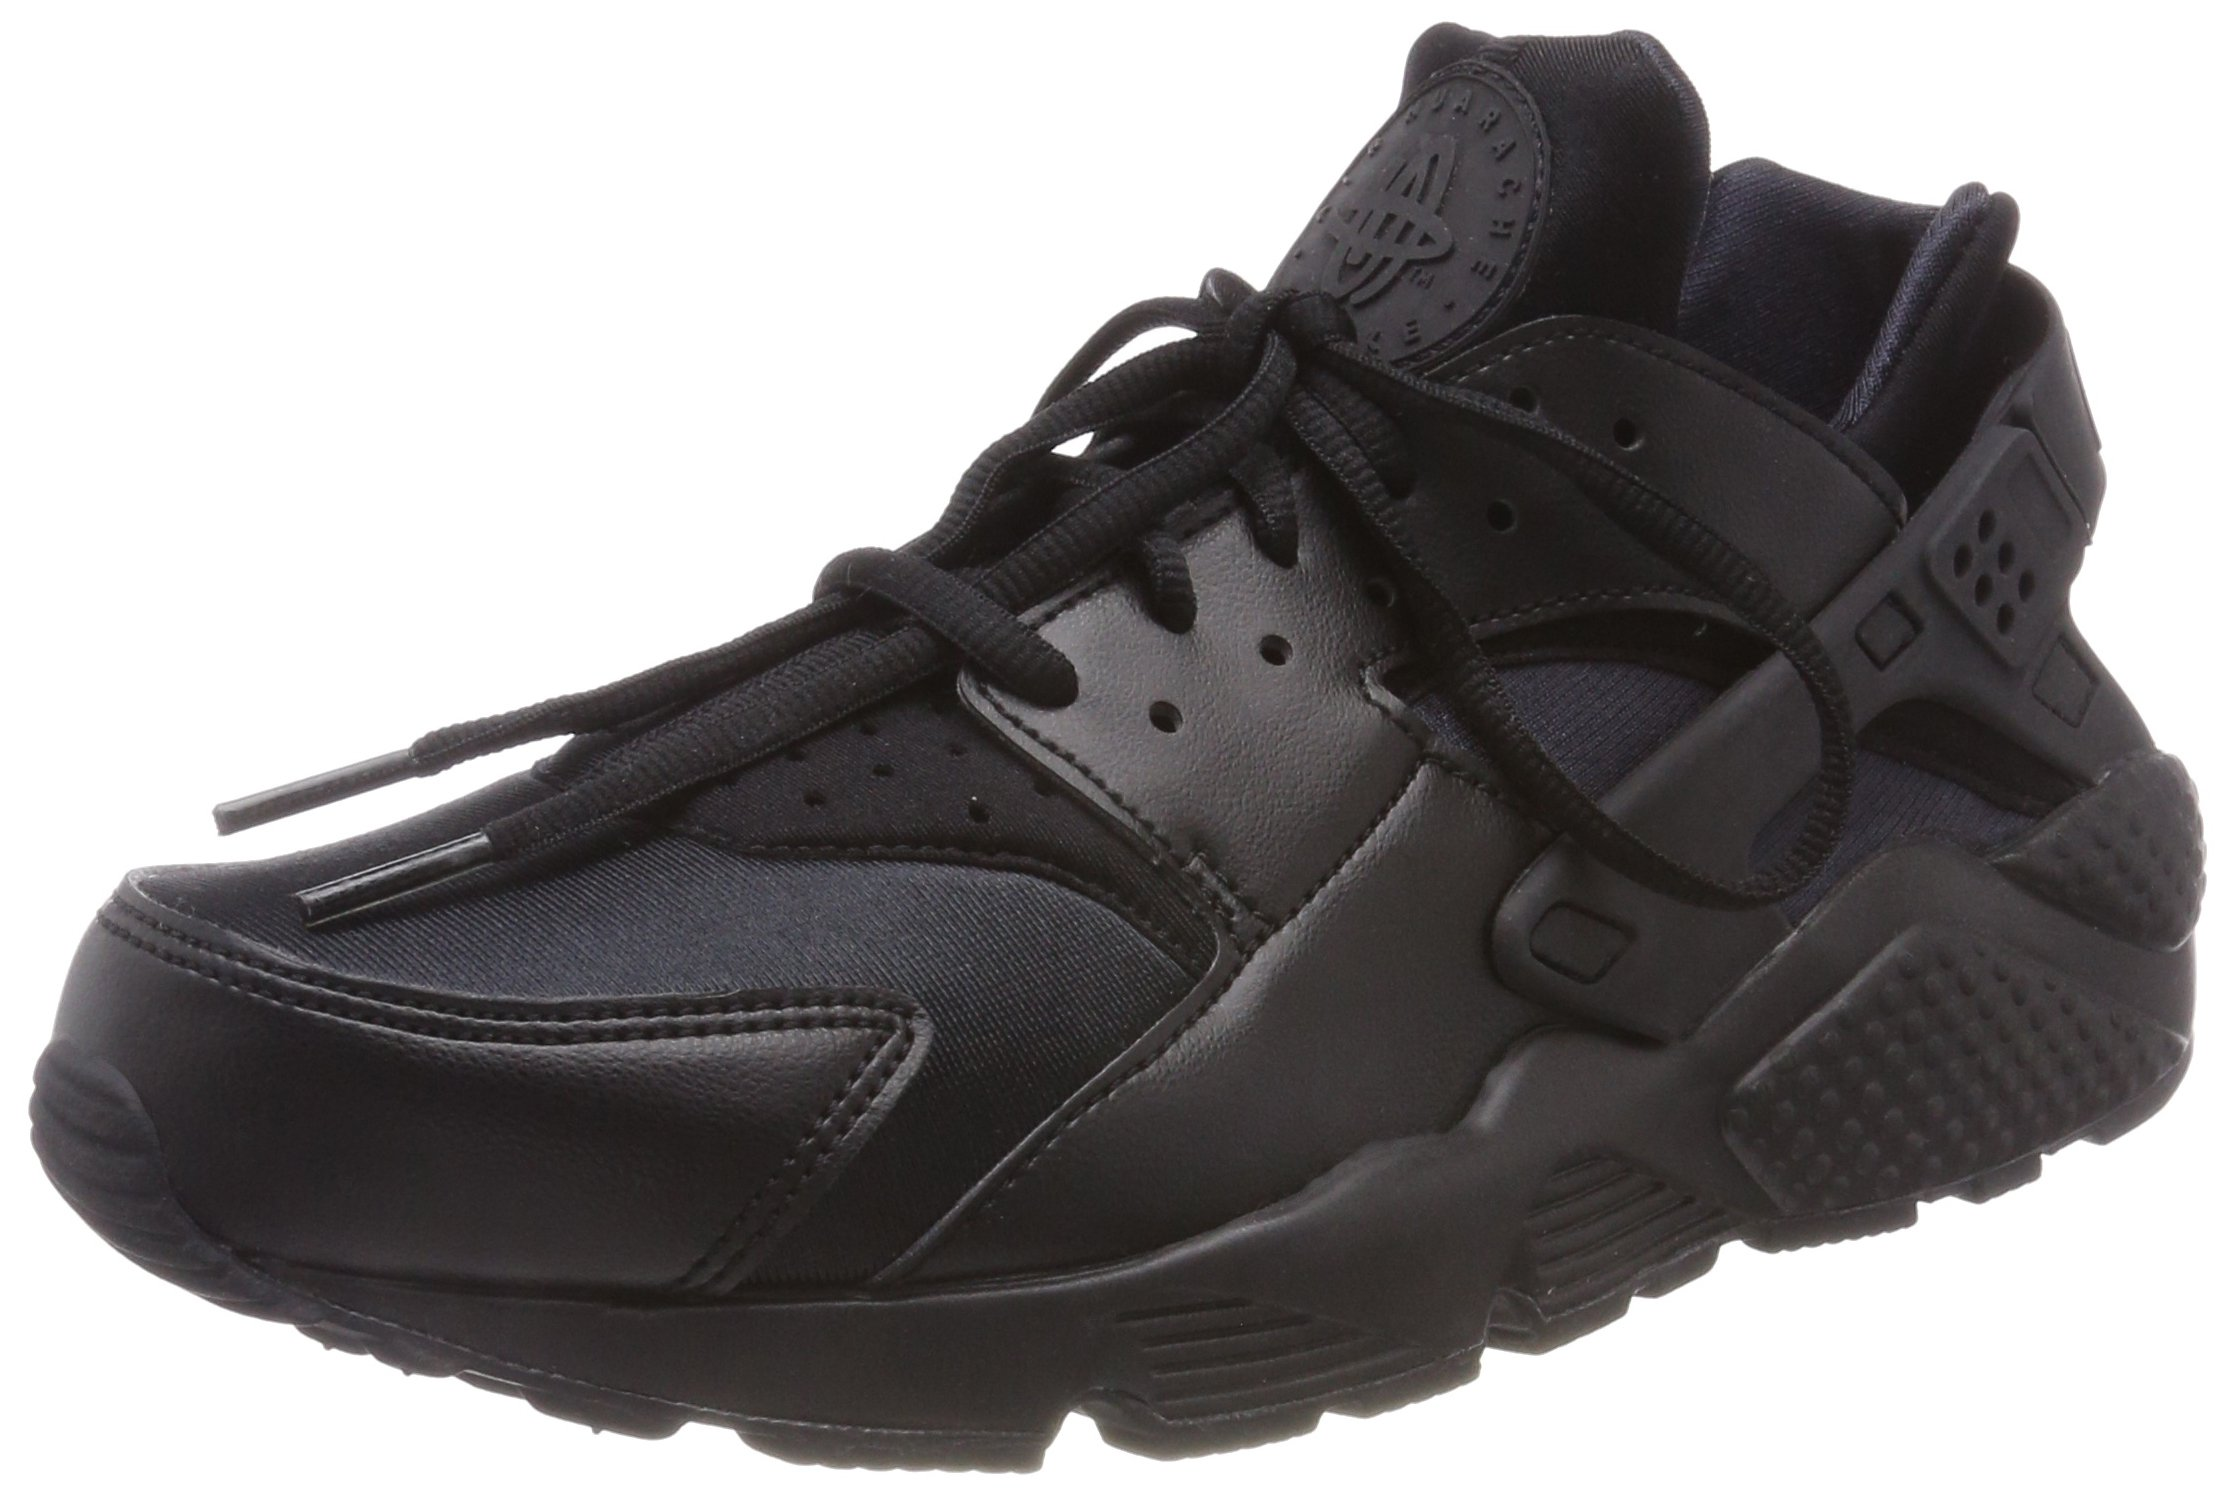 Nike WMNS Air Huarache Run, Women's Sneakers,Black (Black/Black 012), 5.5 UK by Nike